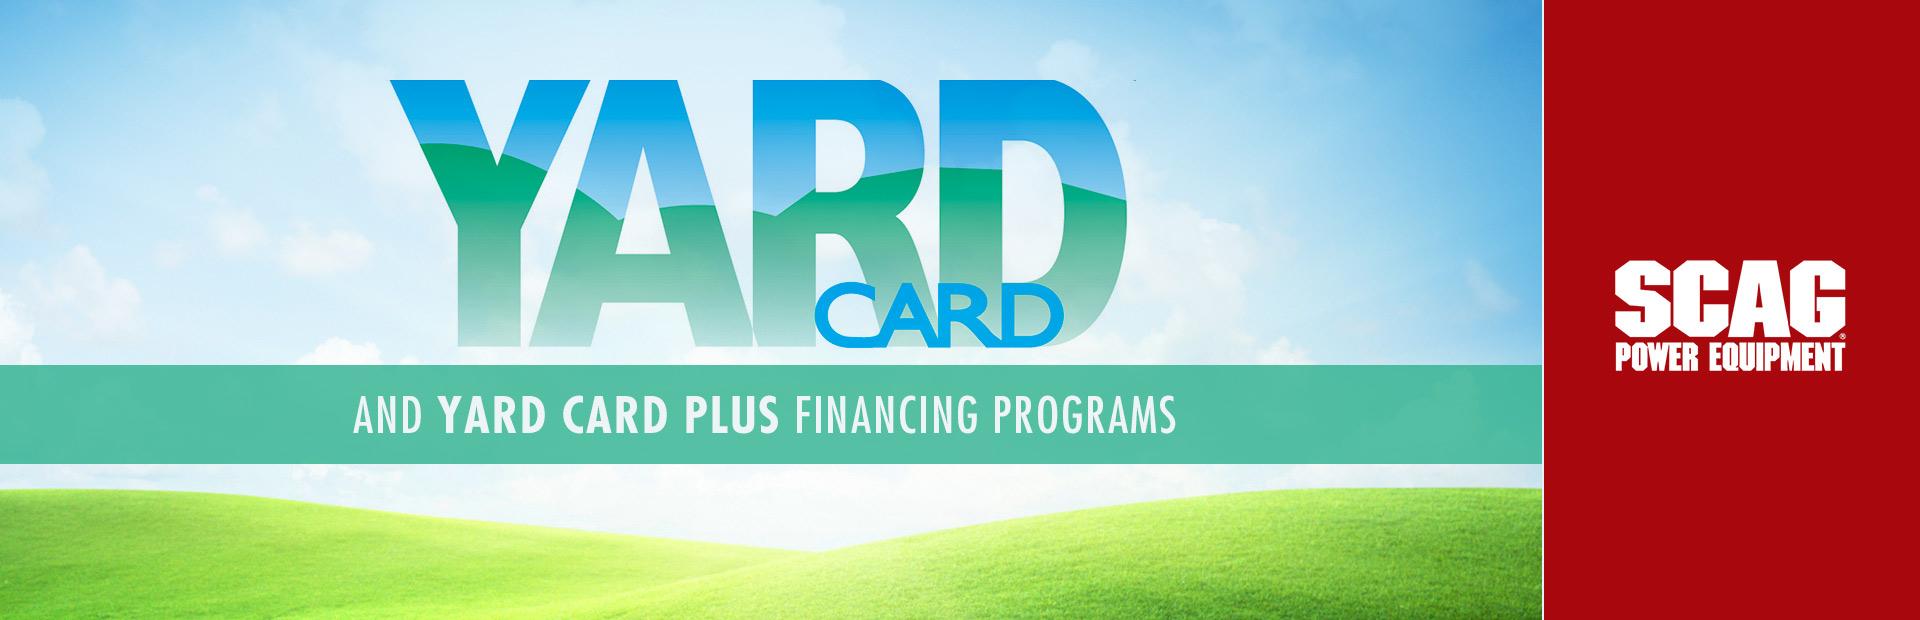 74b63da56b6 Scag - Yard Card and Yard Card Plus Financing Programs Cutting Edge ...